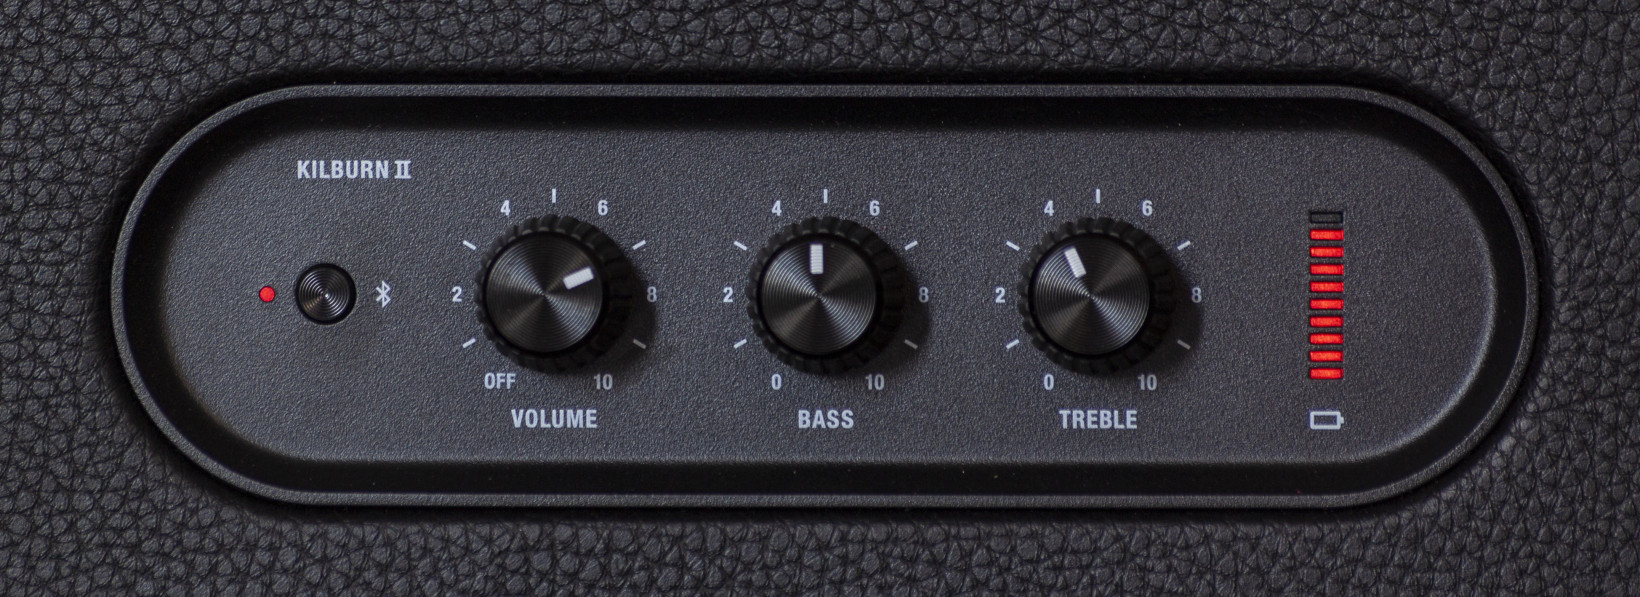 The Kilburn II lets you make minor adjustments to bass and treble